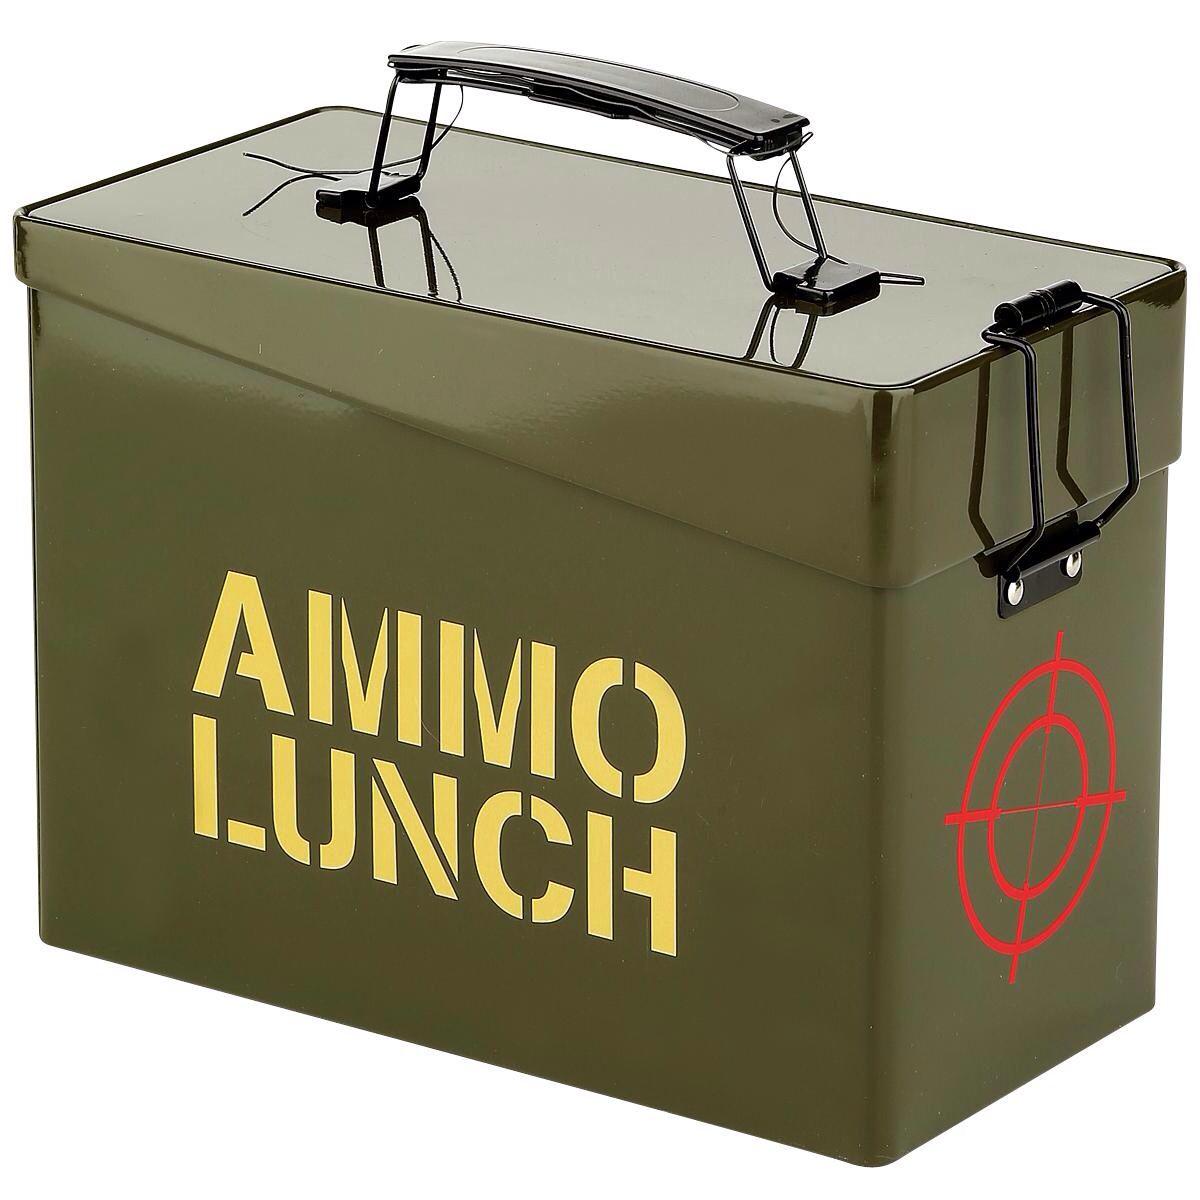 Leger design | Lunchbox van metaal | Pinterest | Lunch box thermos